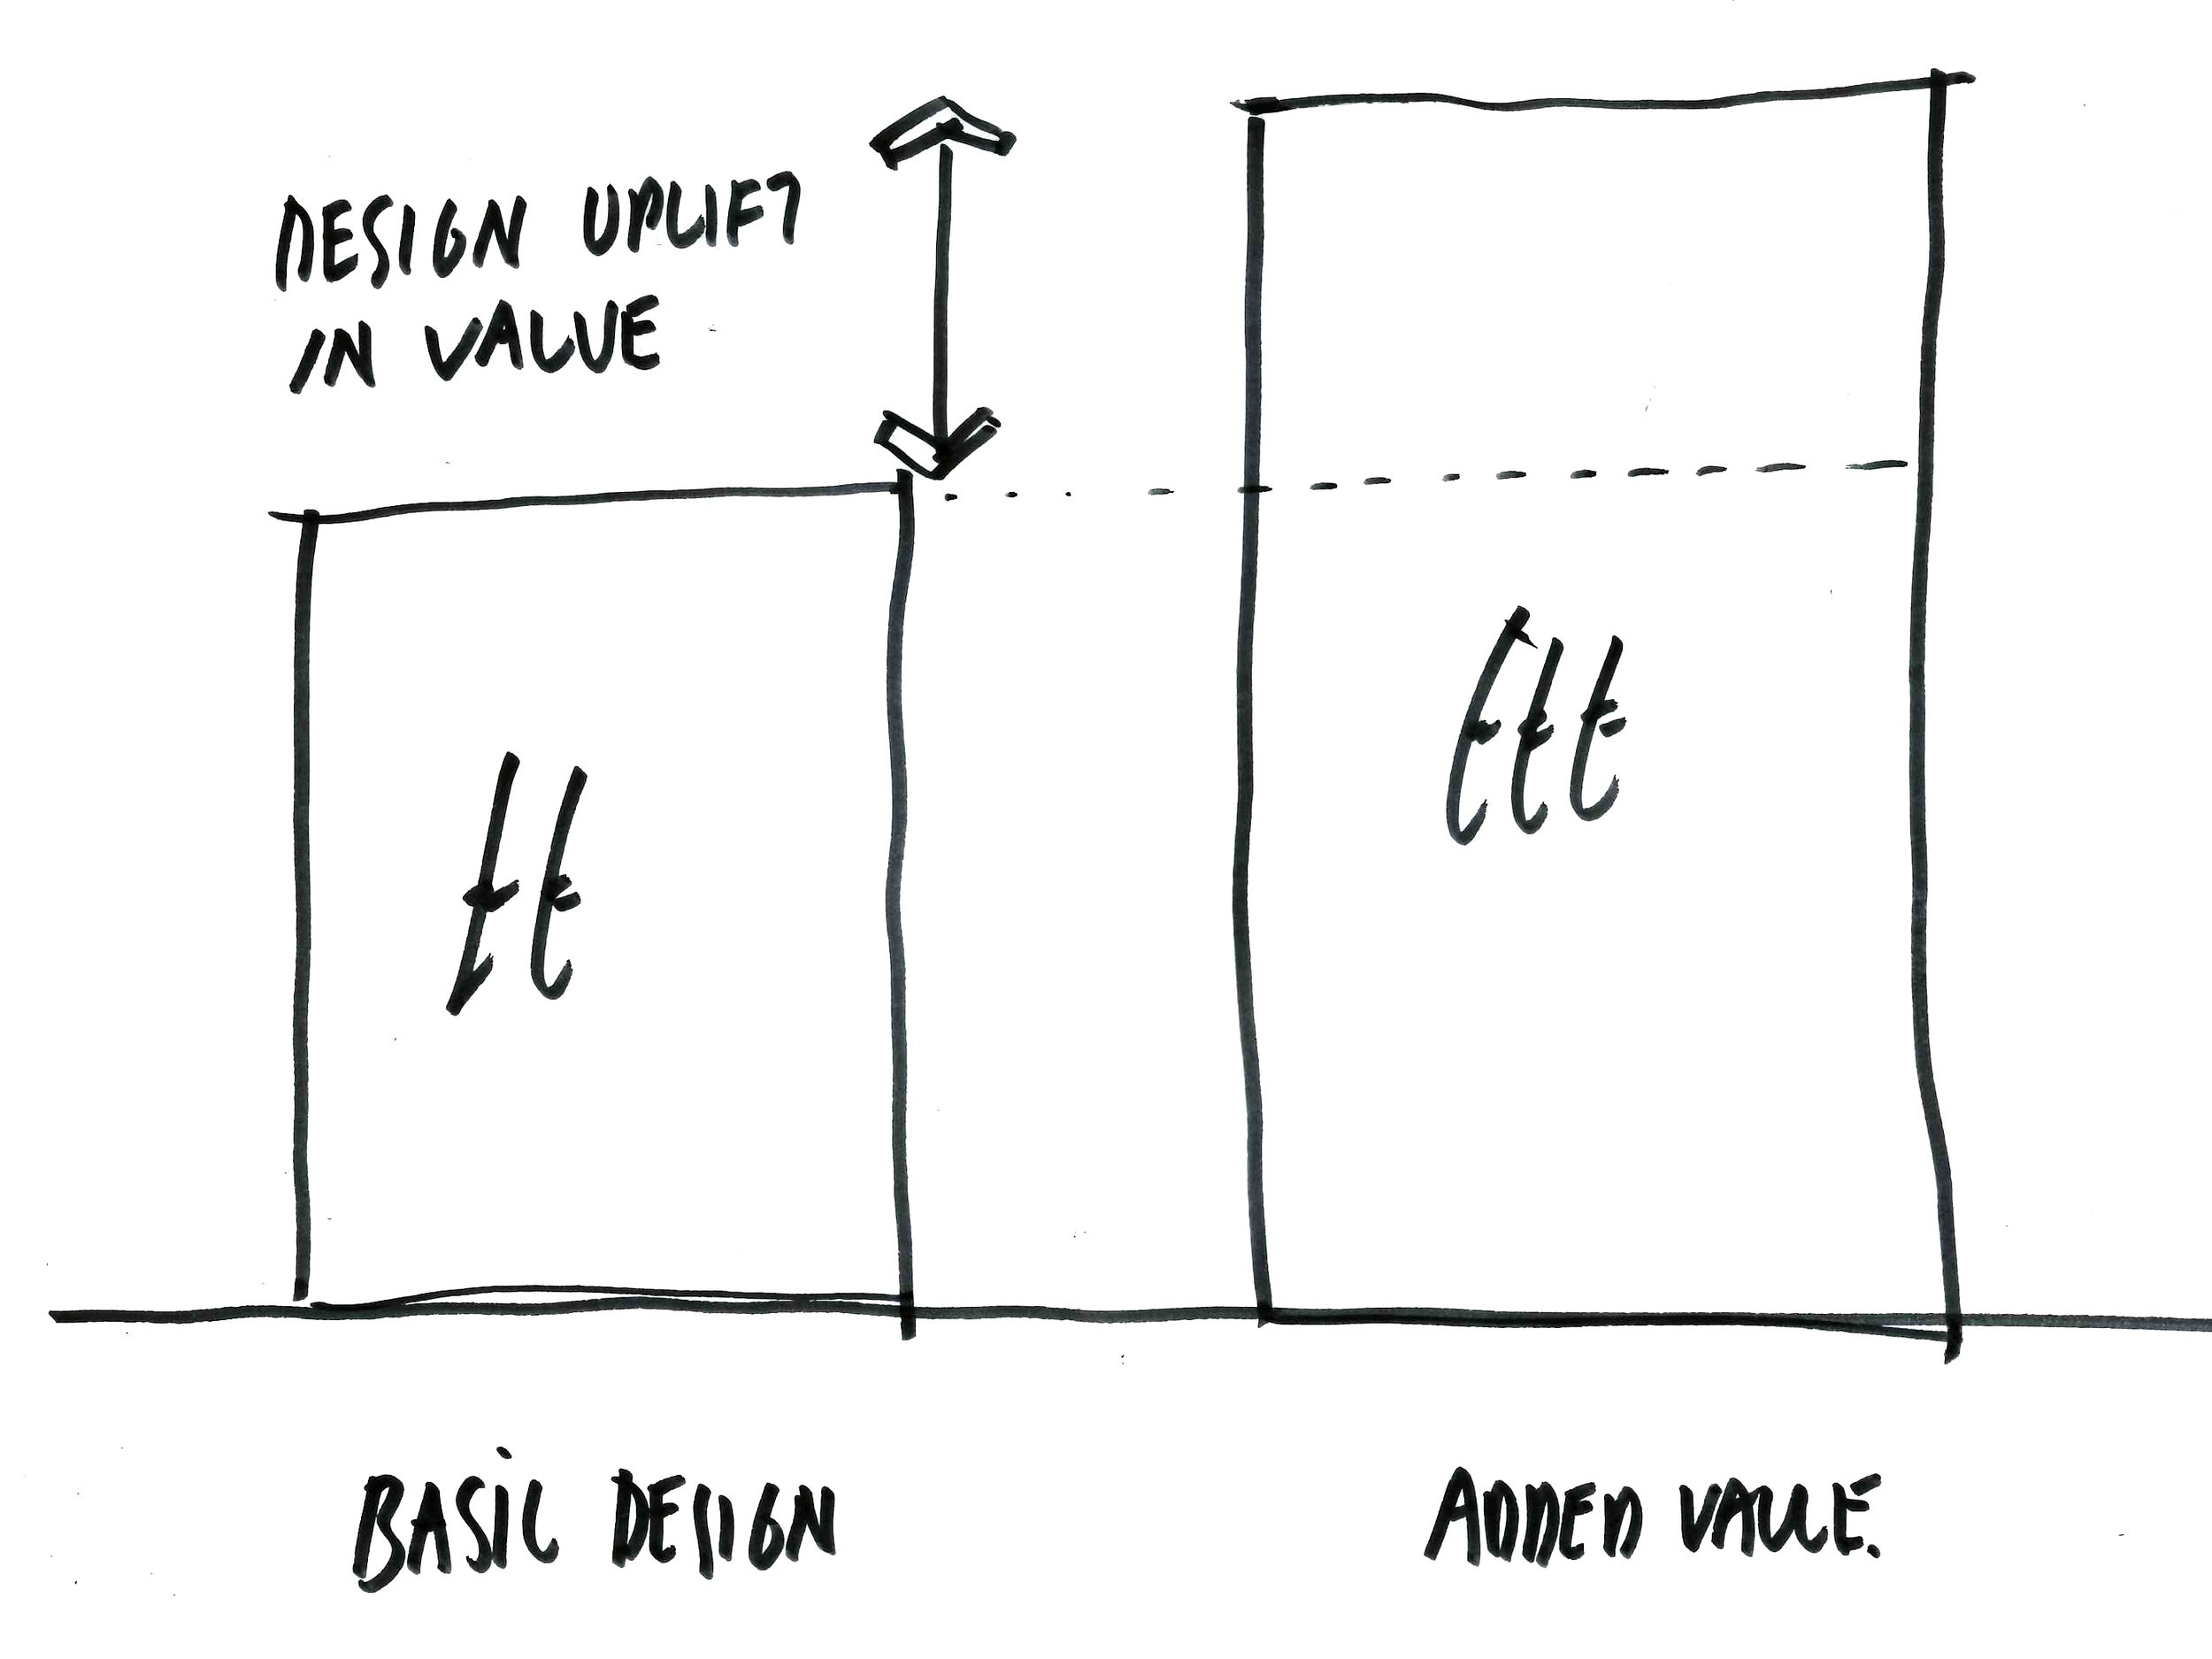 Adding value.jpg